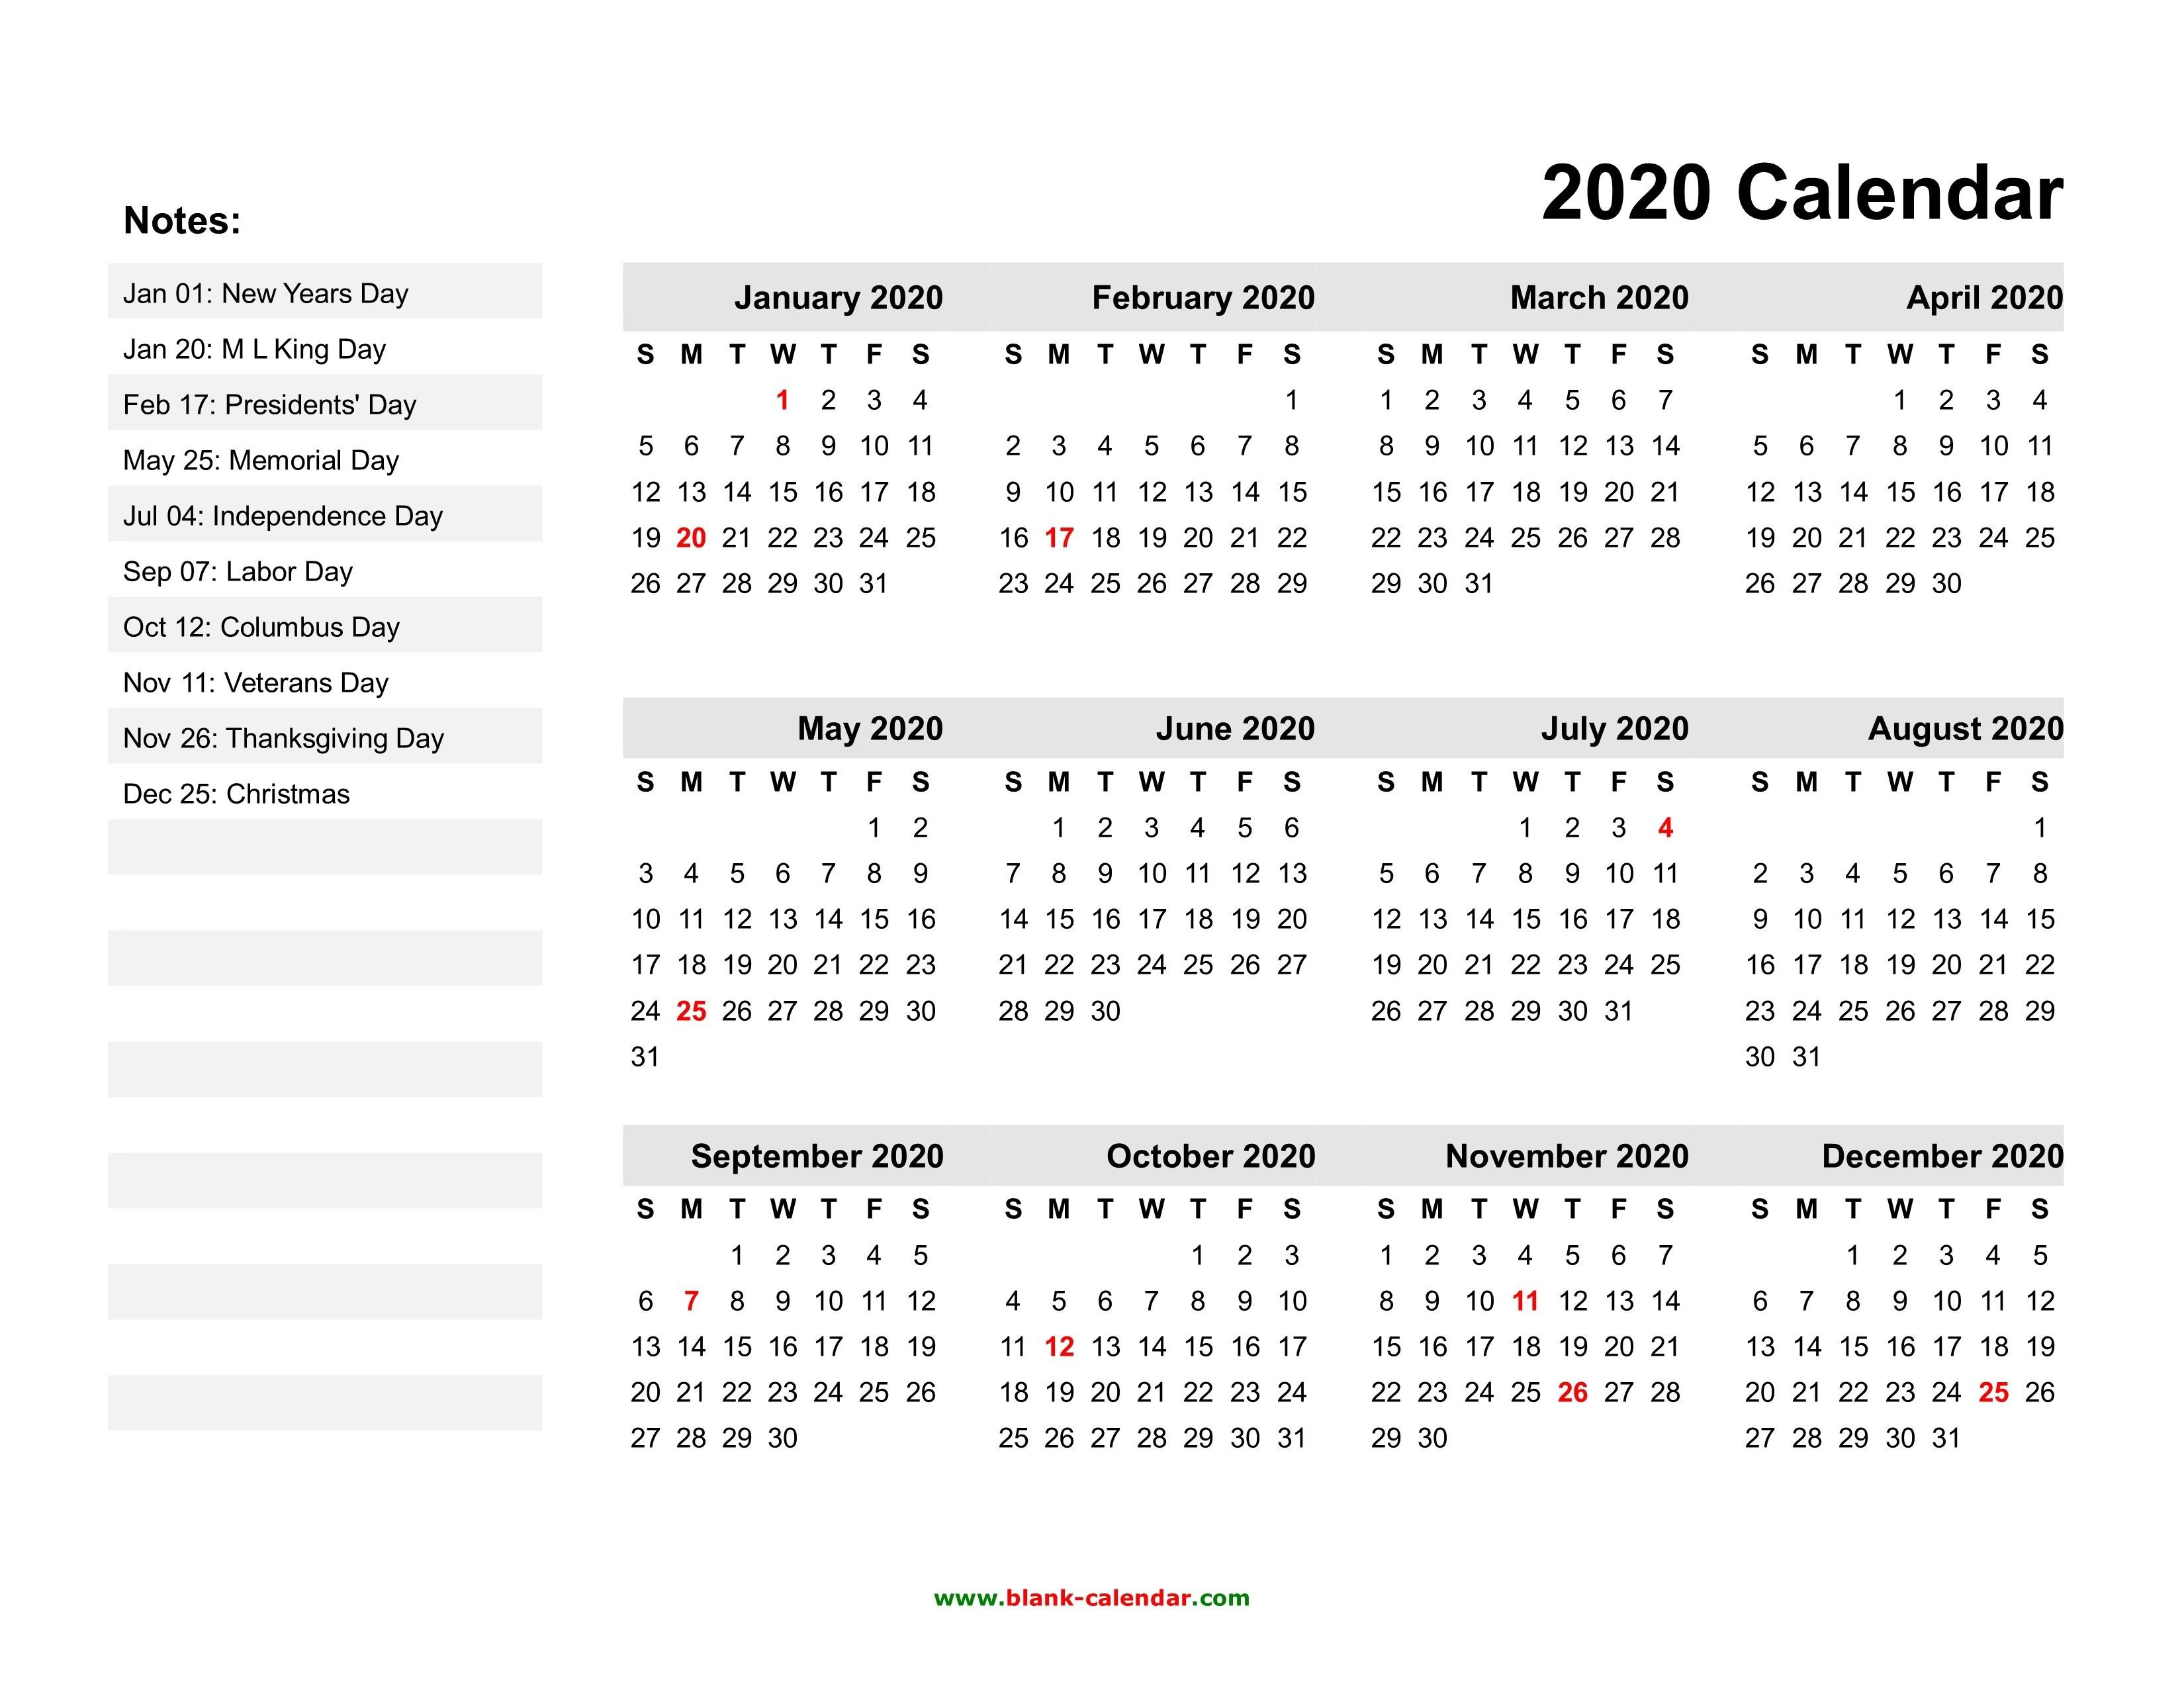 Free Printable 2020 Calendars With Holidays | Printable Printable Calenders With Date And Time On 8 1/2 X 11 Paper